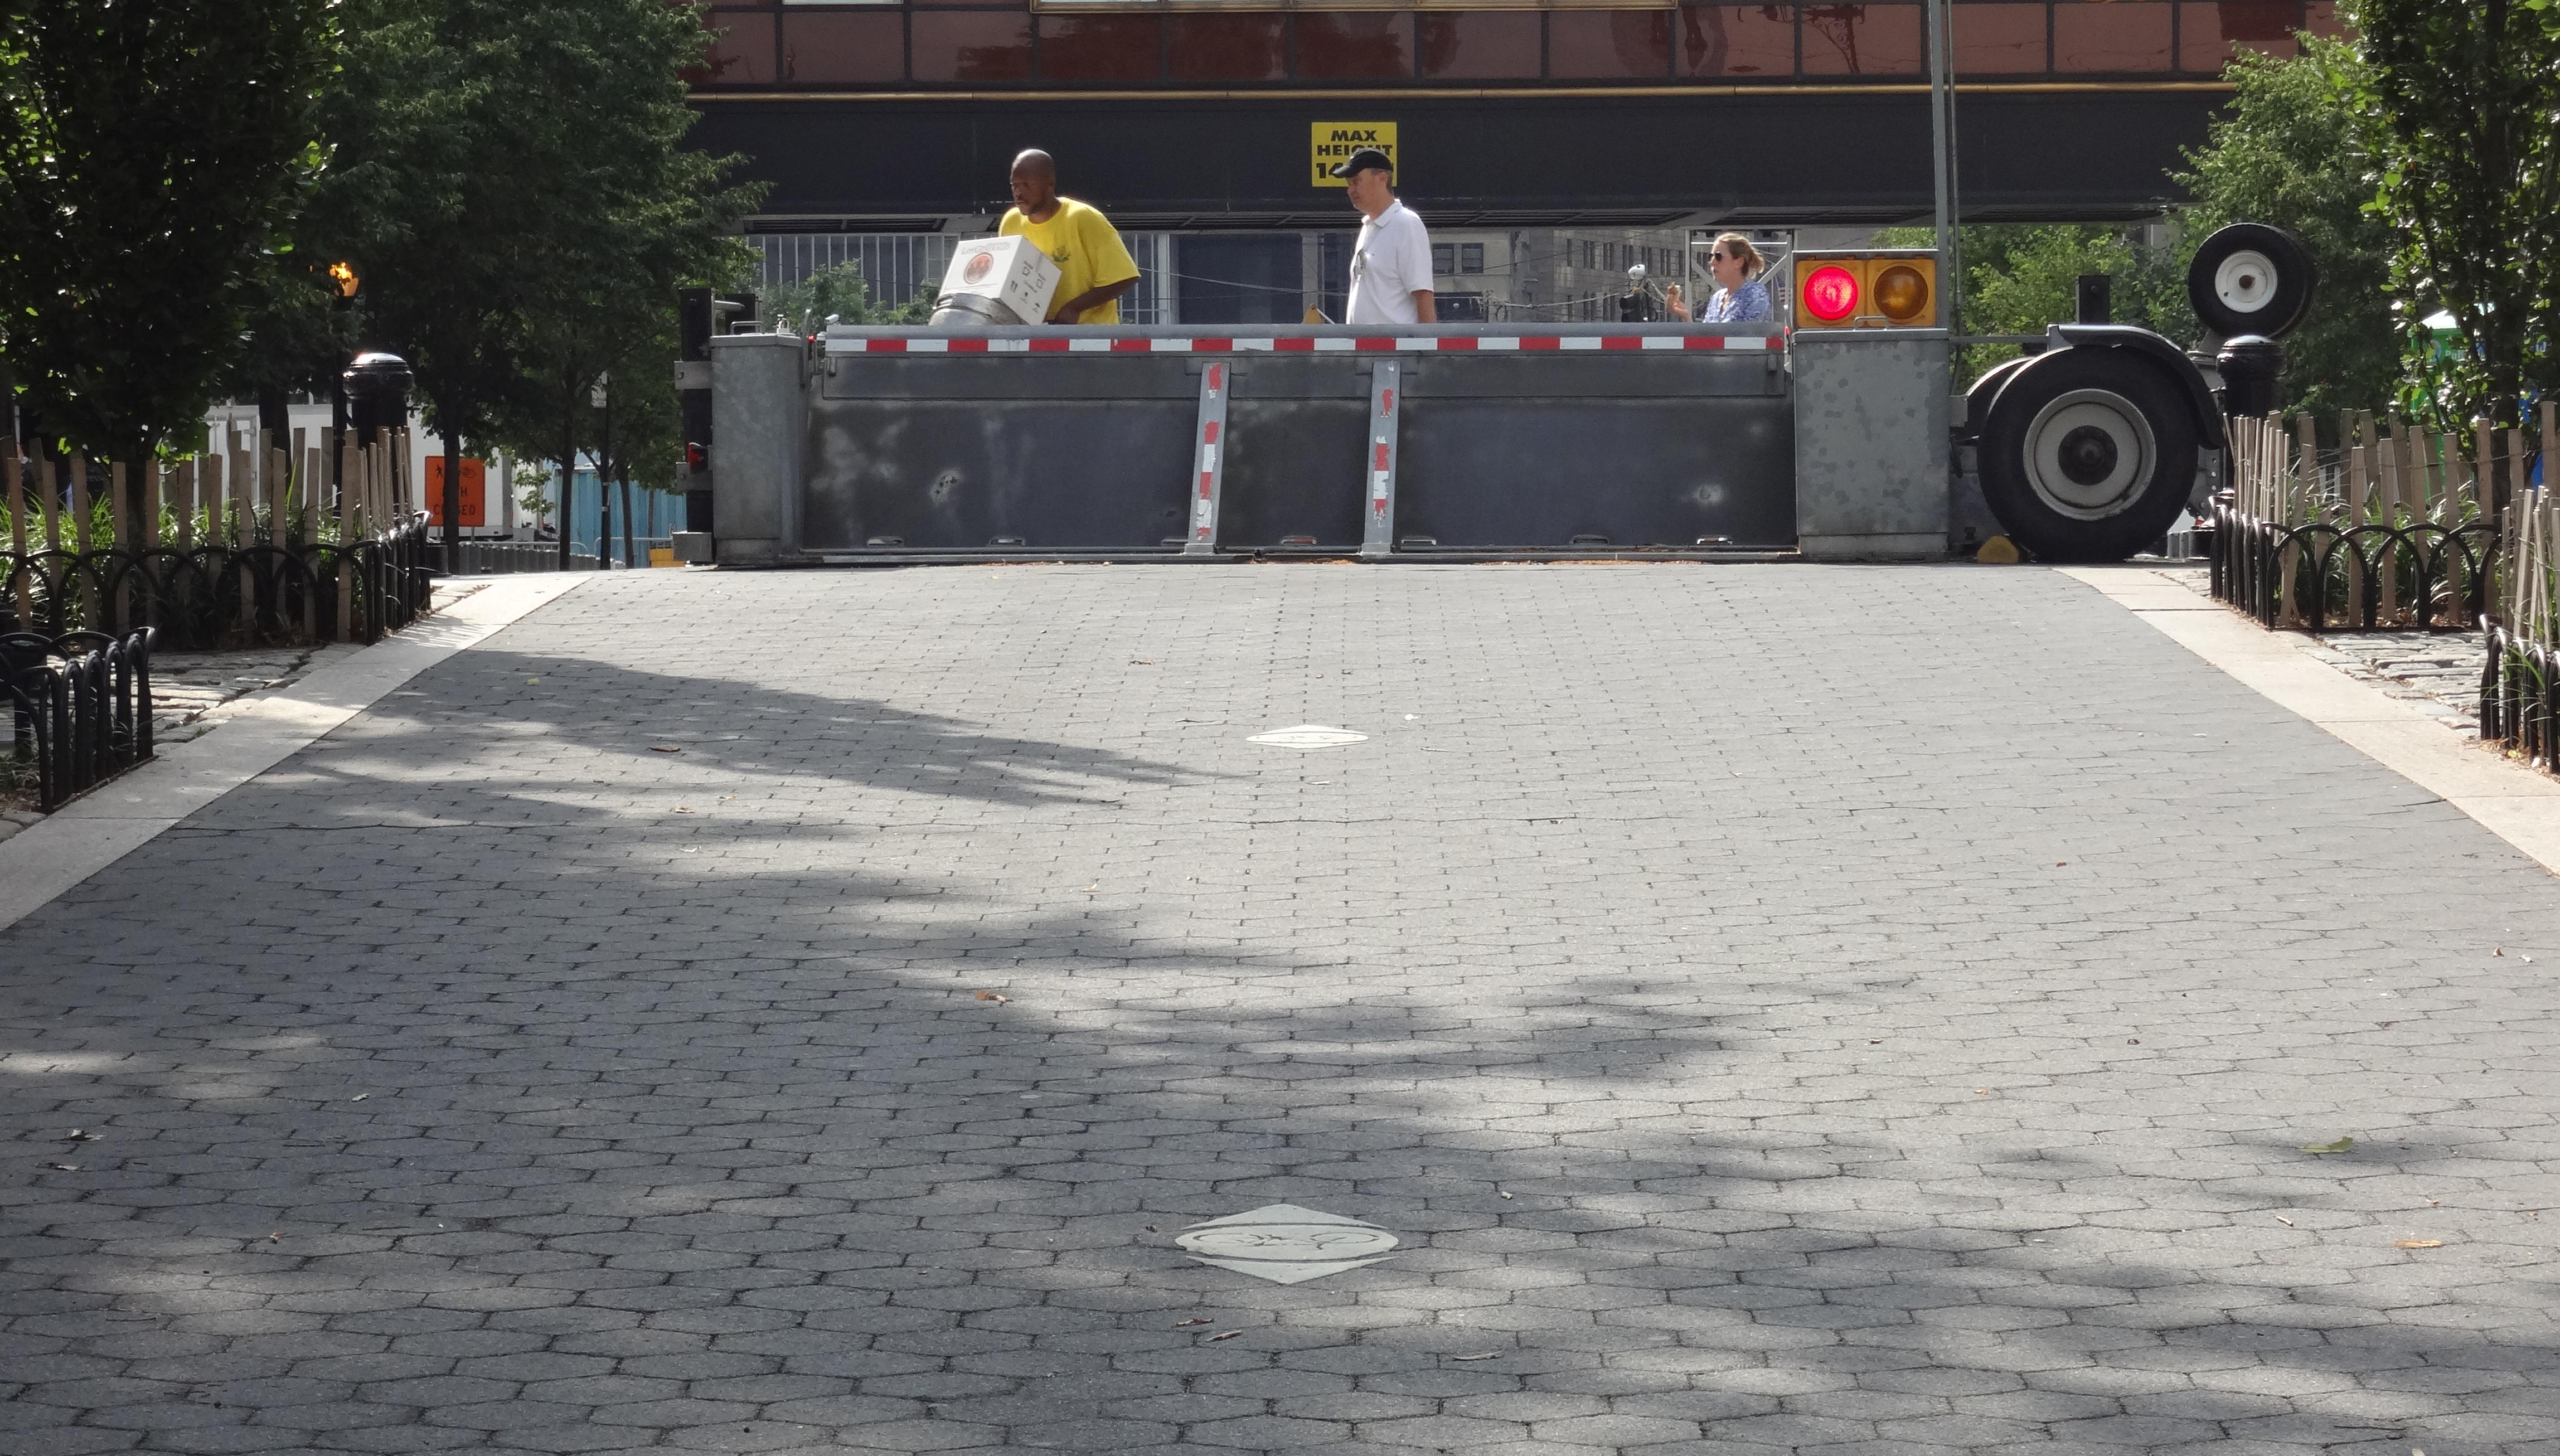 Ovstruction on bike path